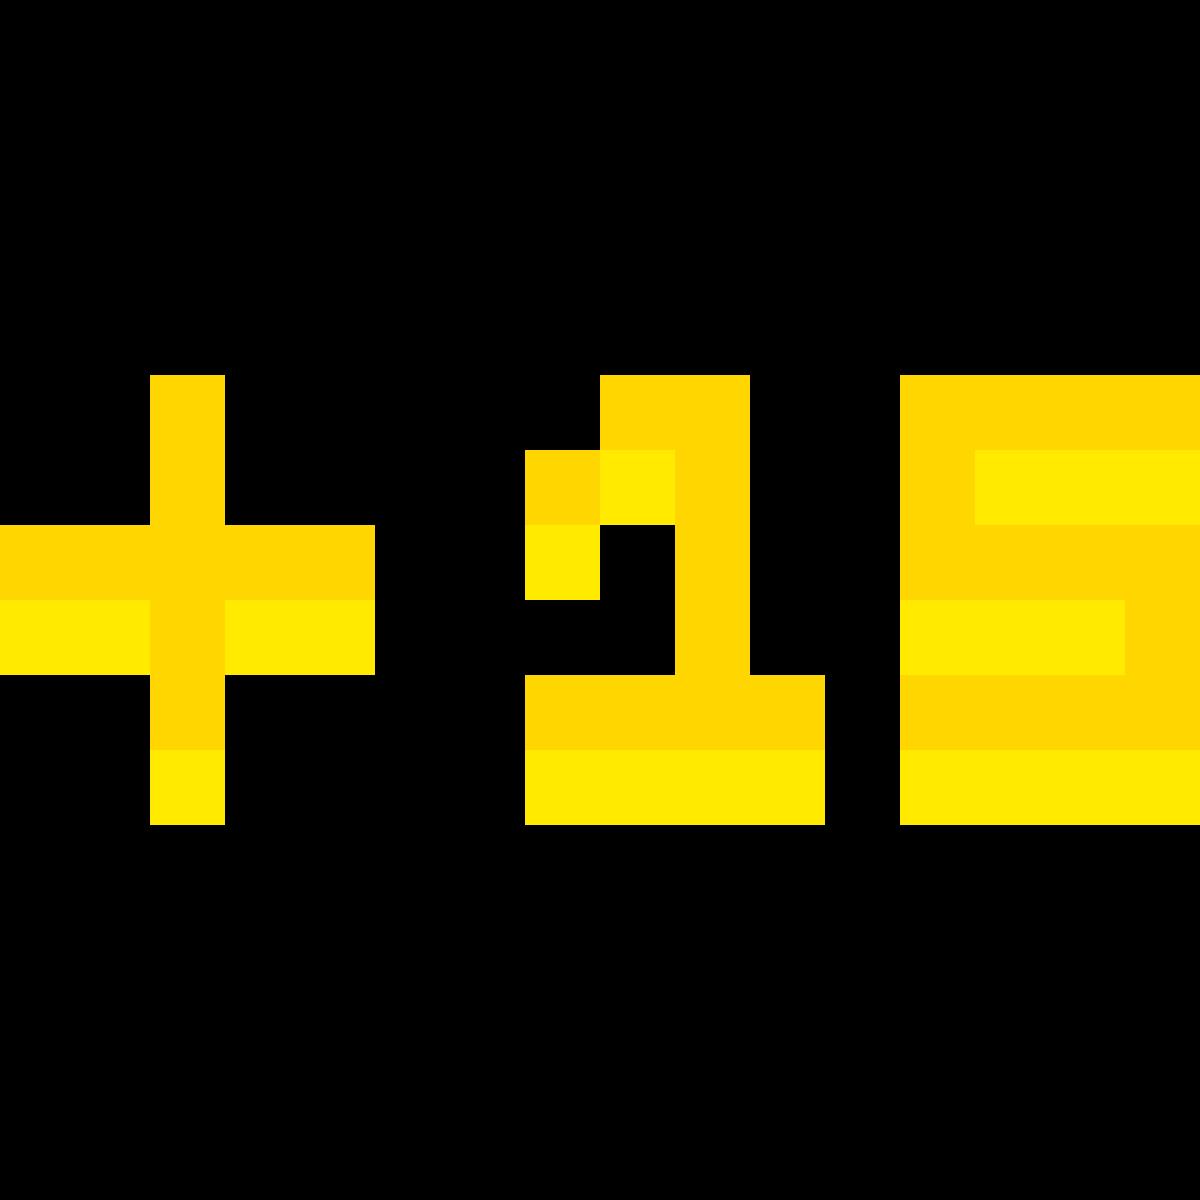 + 15 by 796